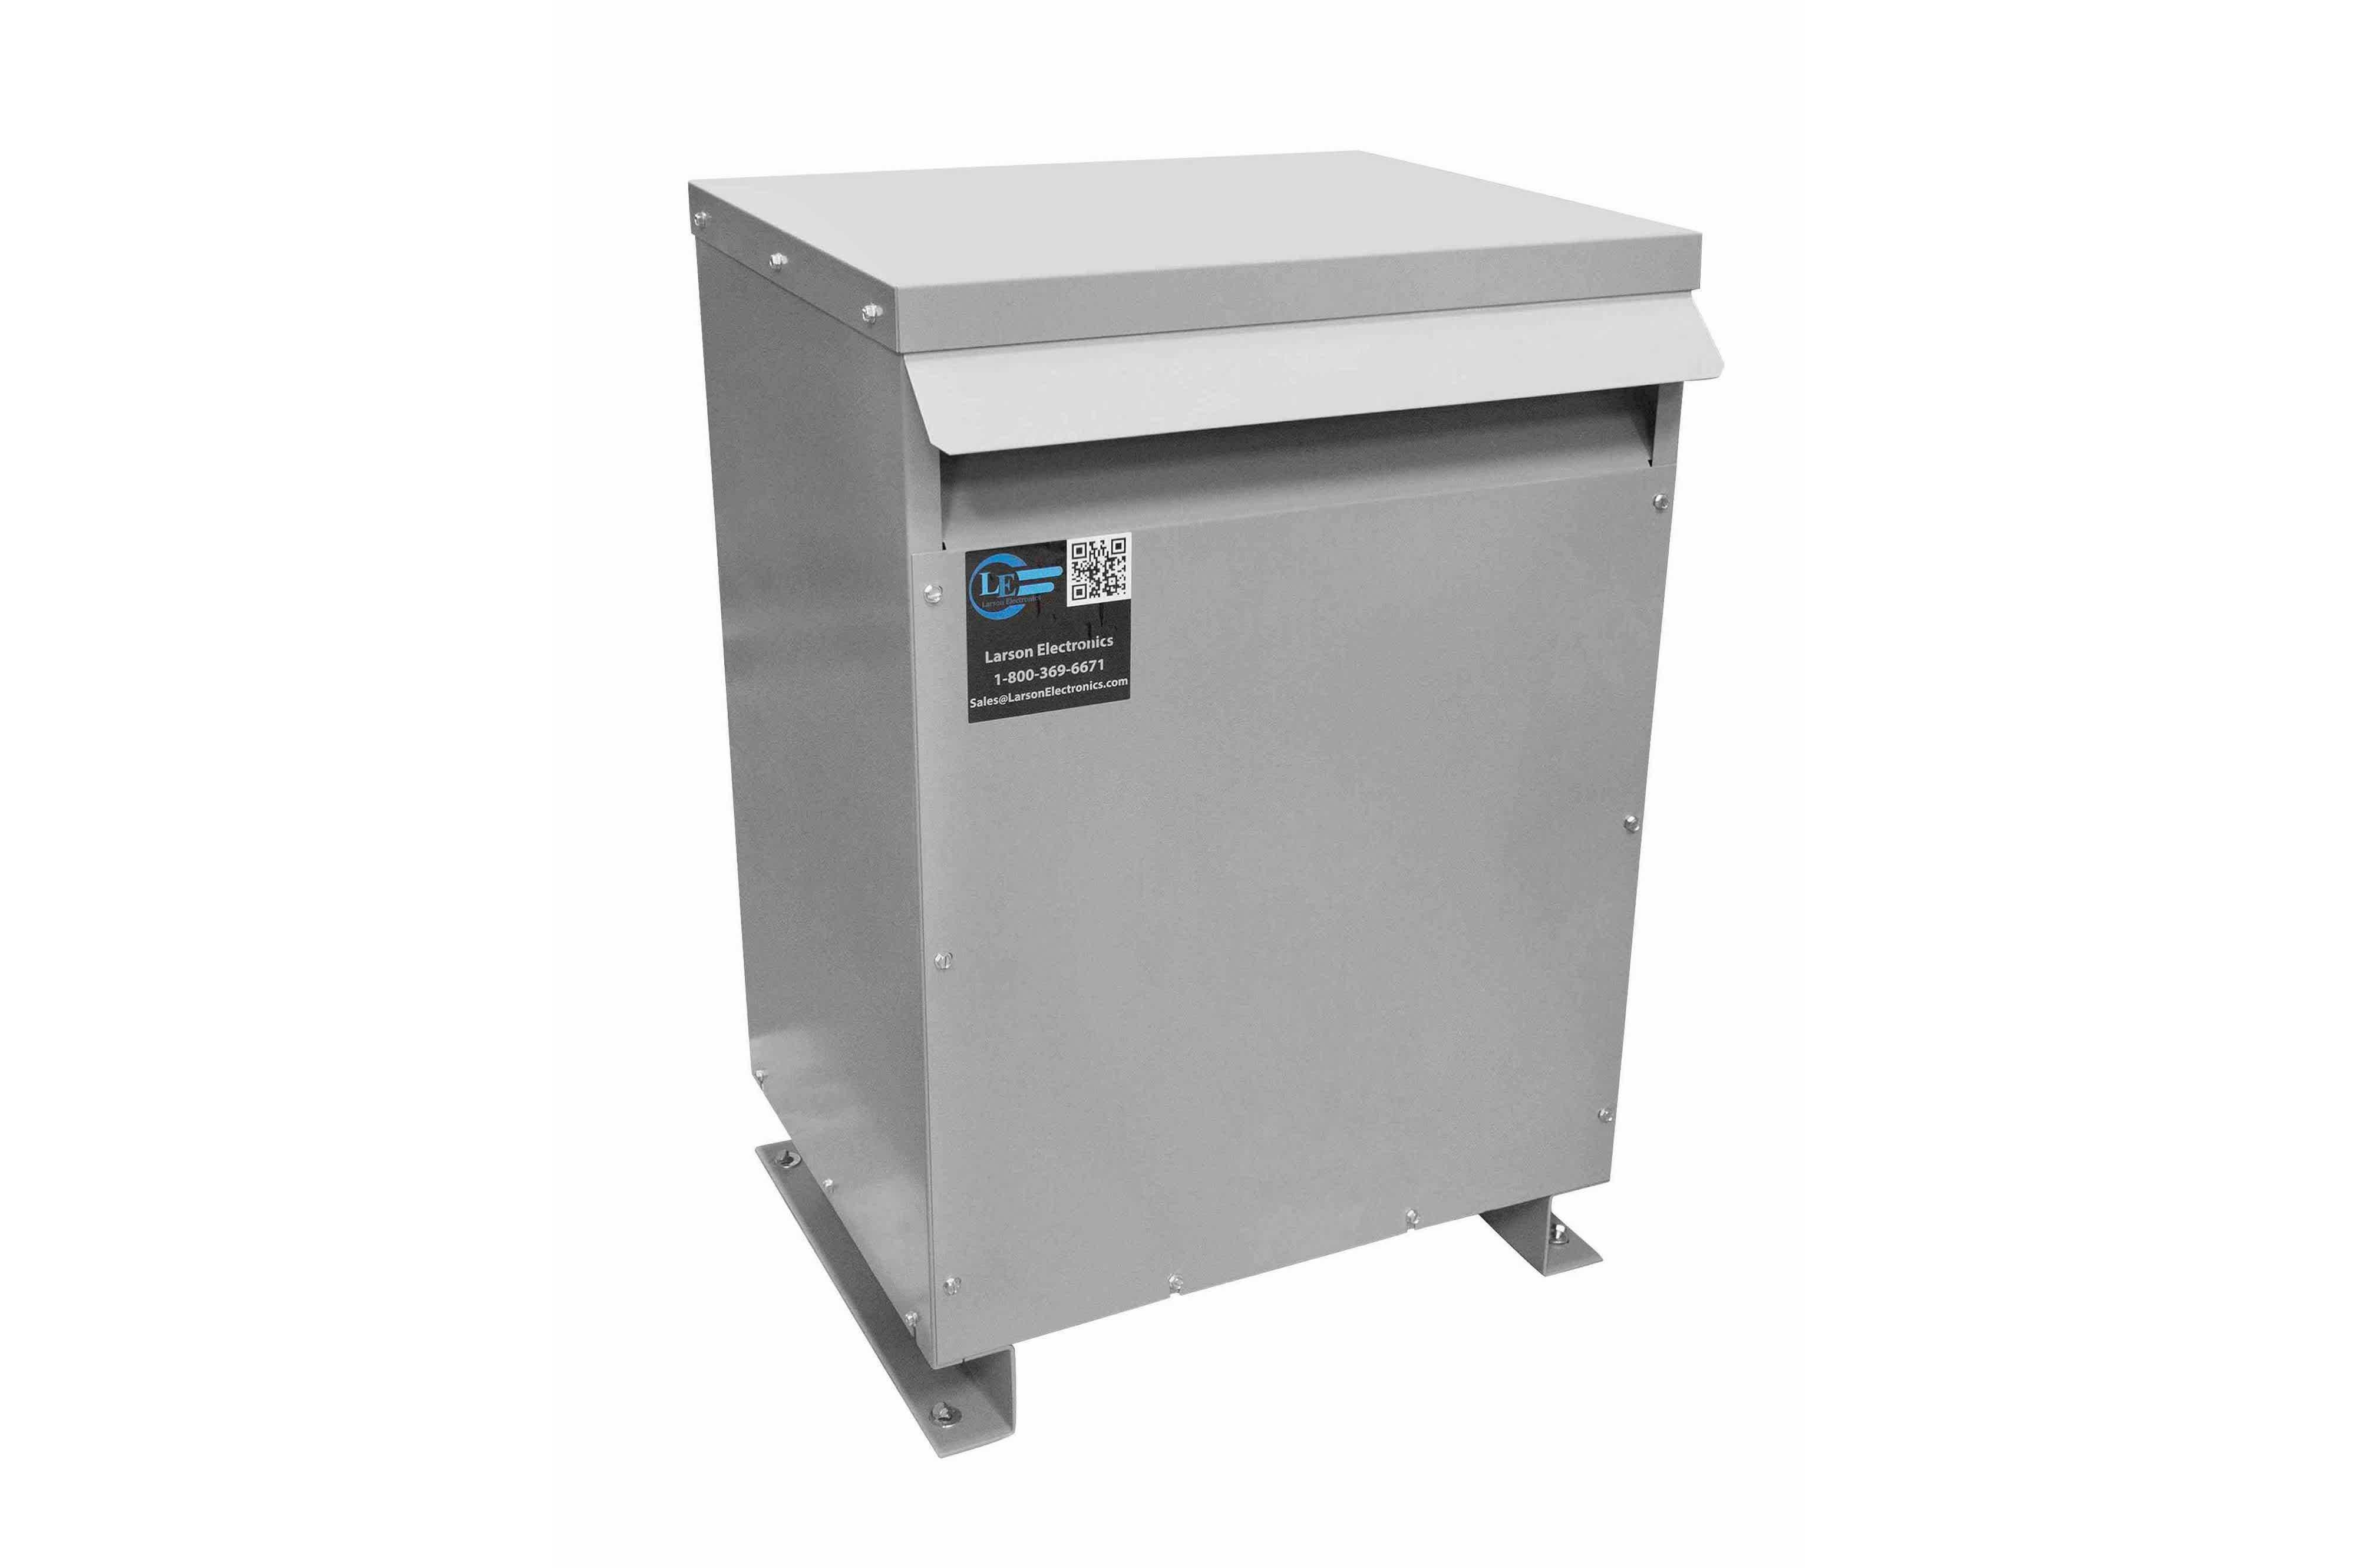 75 kVA 3PH Isolation Transformer, 600V Wye Primary, 480Y/277 Wye-N Secondary, N3R, Ventilated, 60 Hz